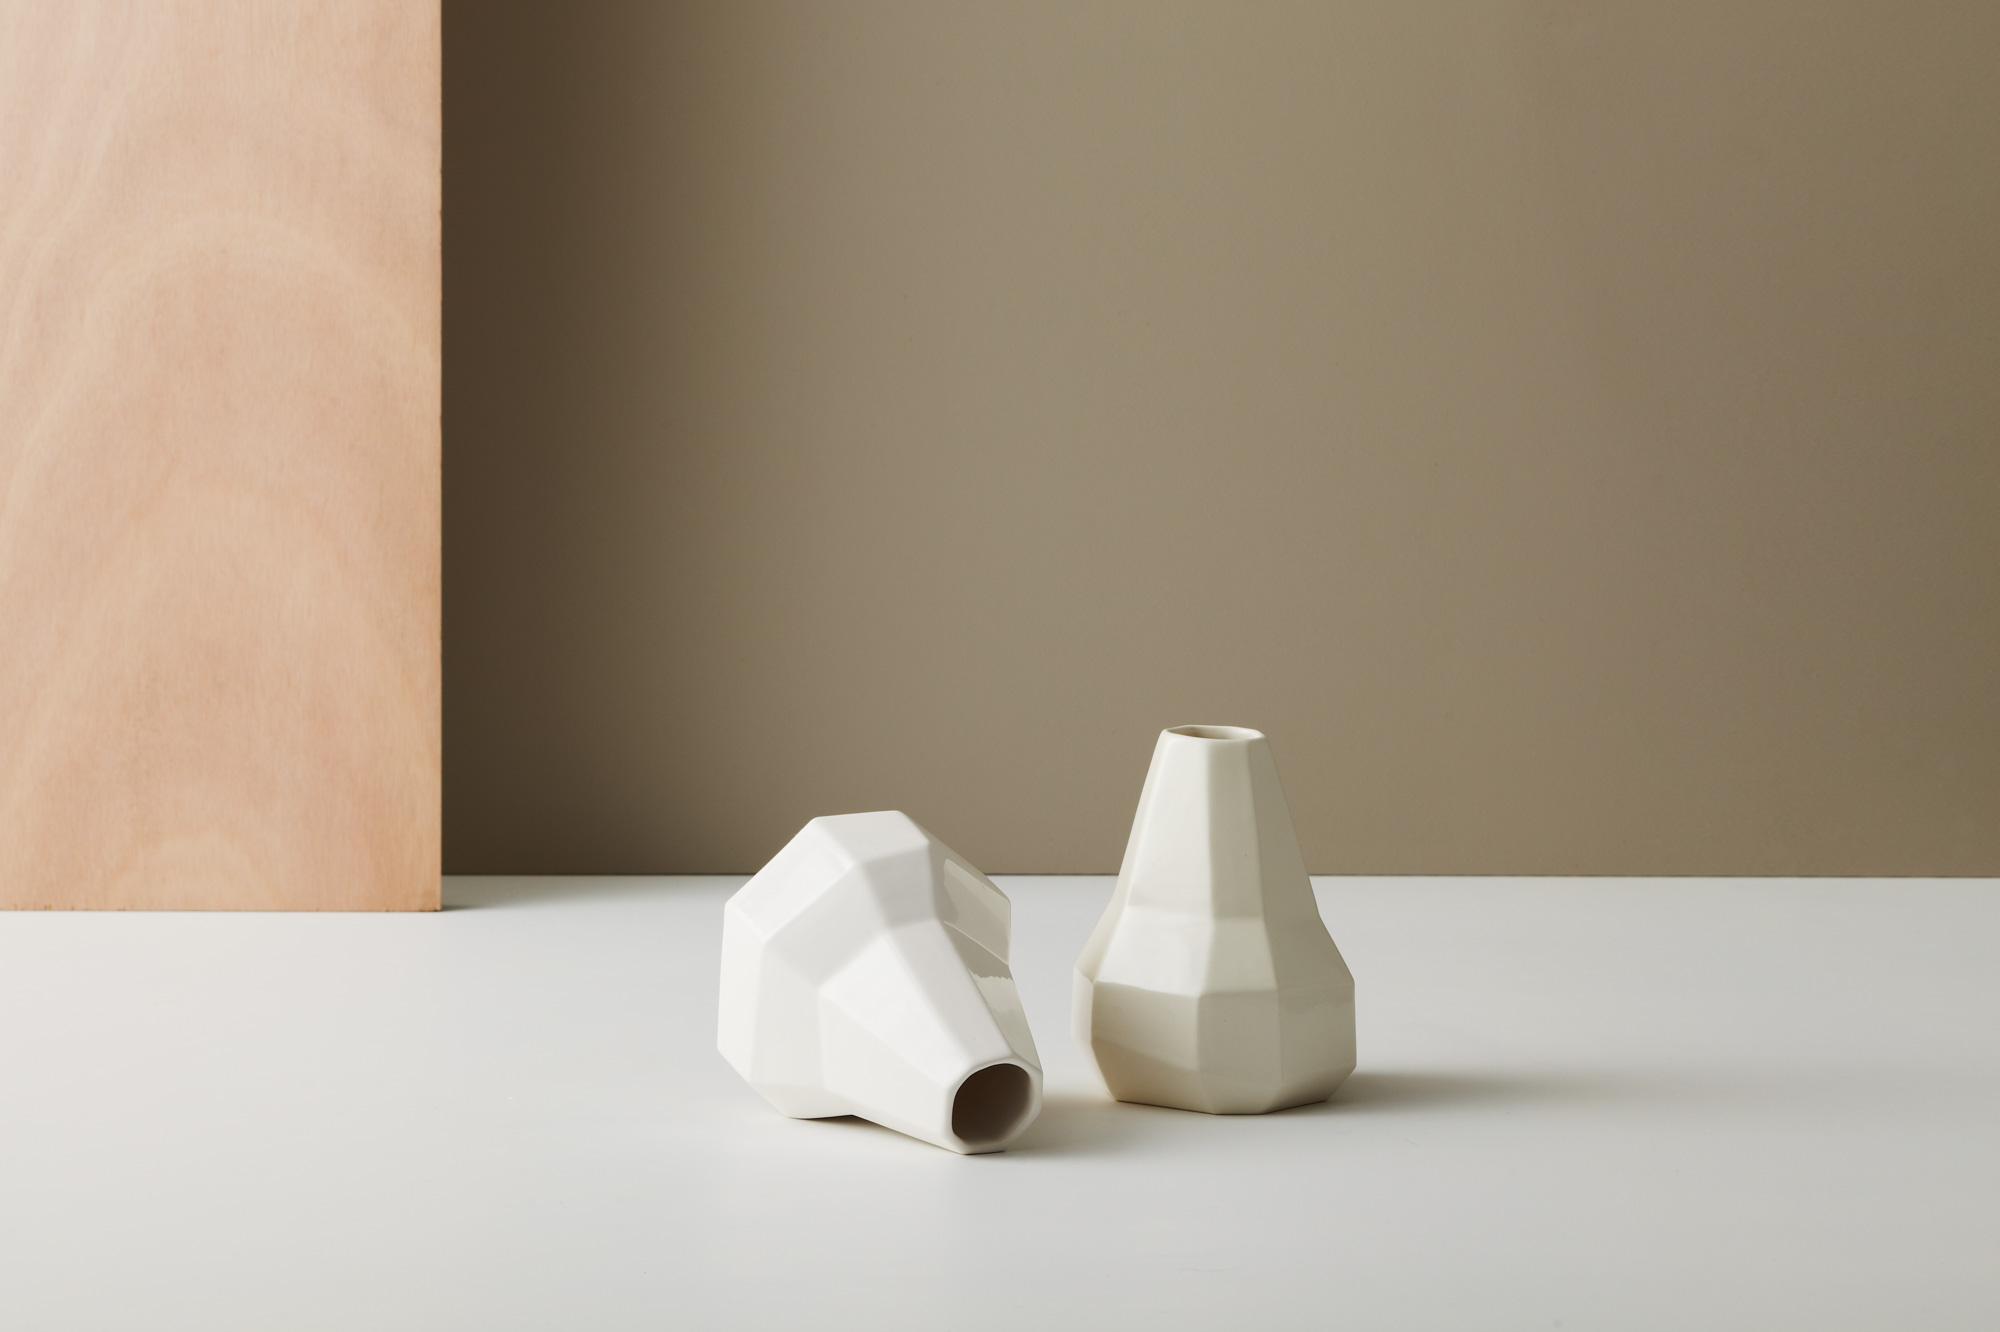 Gidon Bing Ceramics Studio |  Limited editions |  Sunday 20th Dec, 11am-3pm |  Boatshed, 19 Ngapipi Rd |   http://gidonbingceramics.com